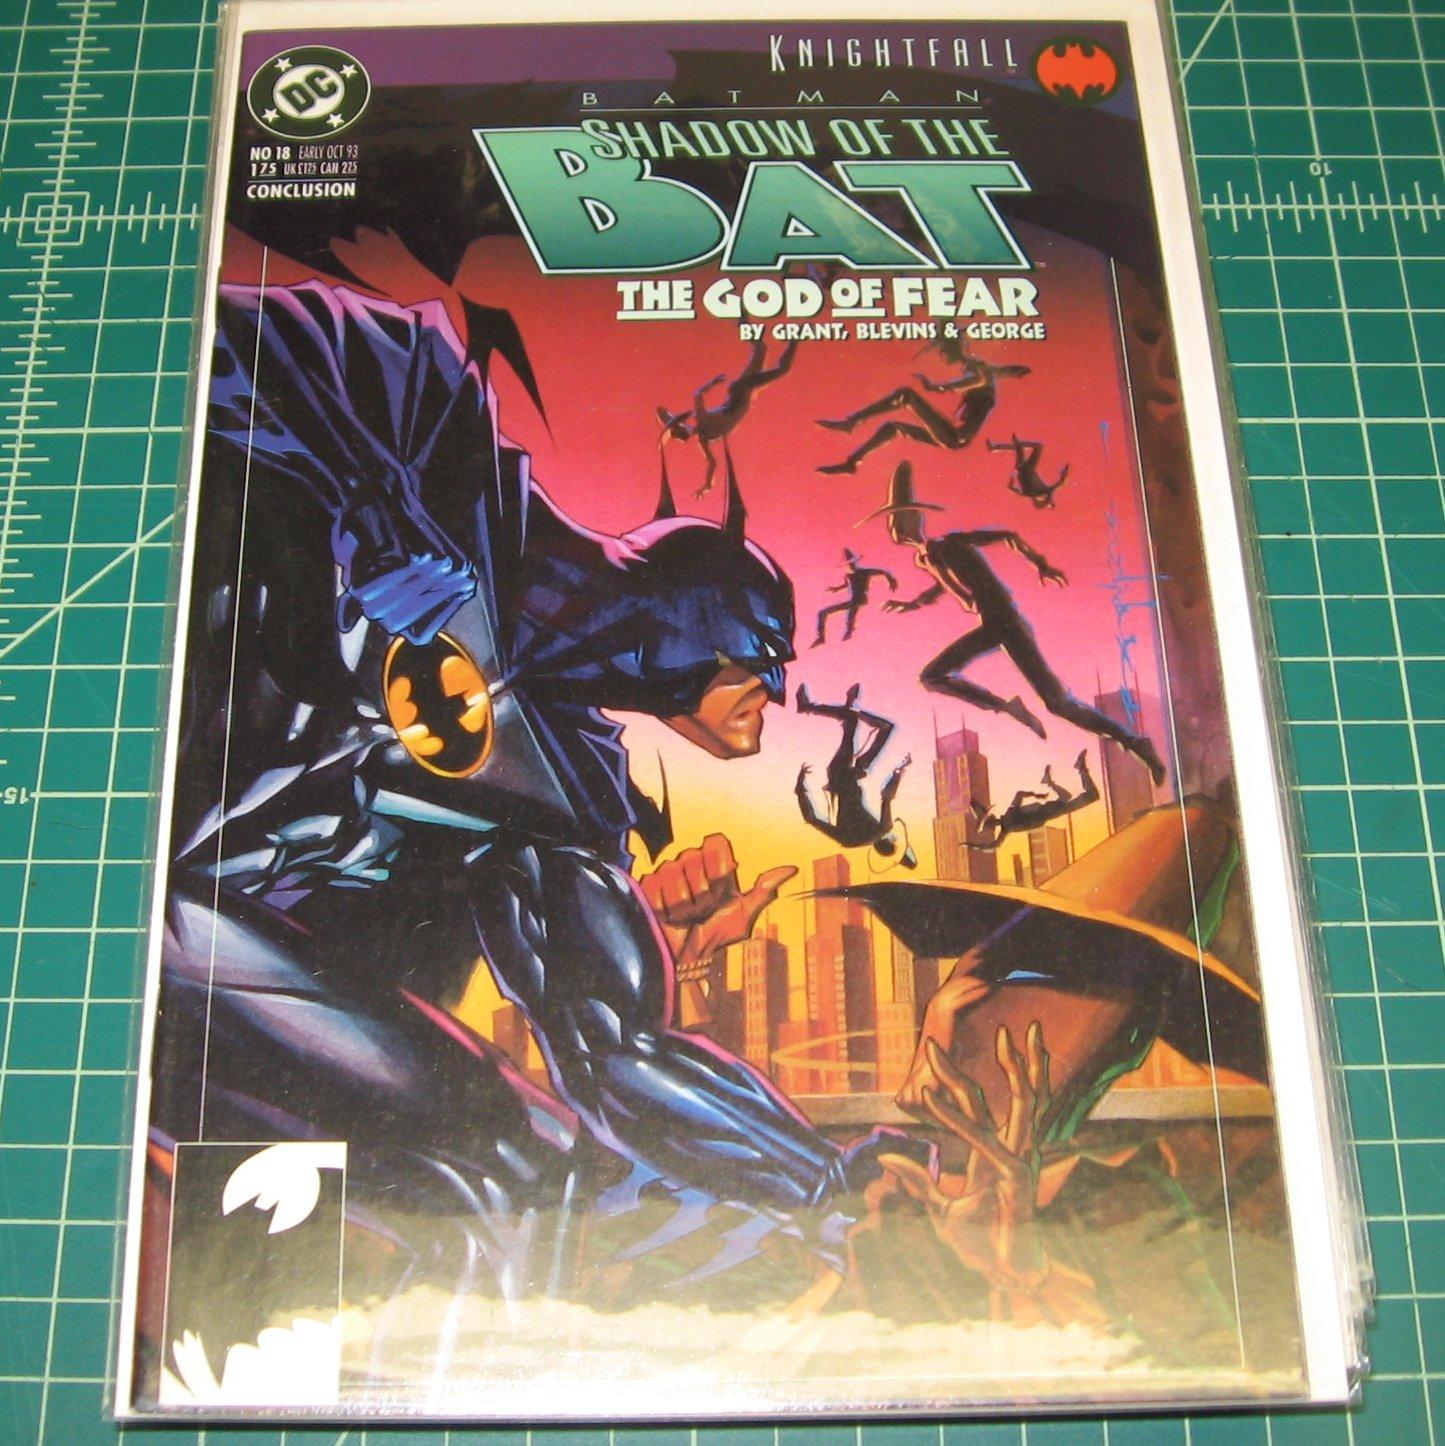 BATMAN Shadow of the Bat #18 - Alan Grant - DC Comics - The God of Fear - Knightfall